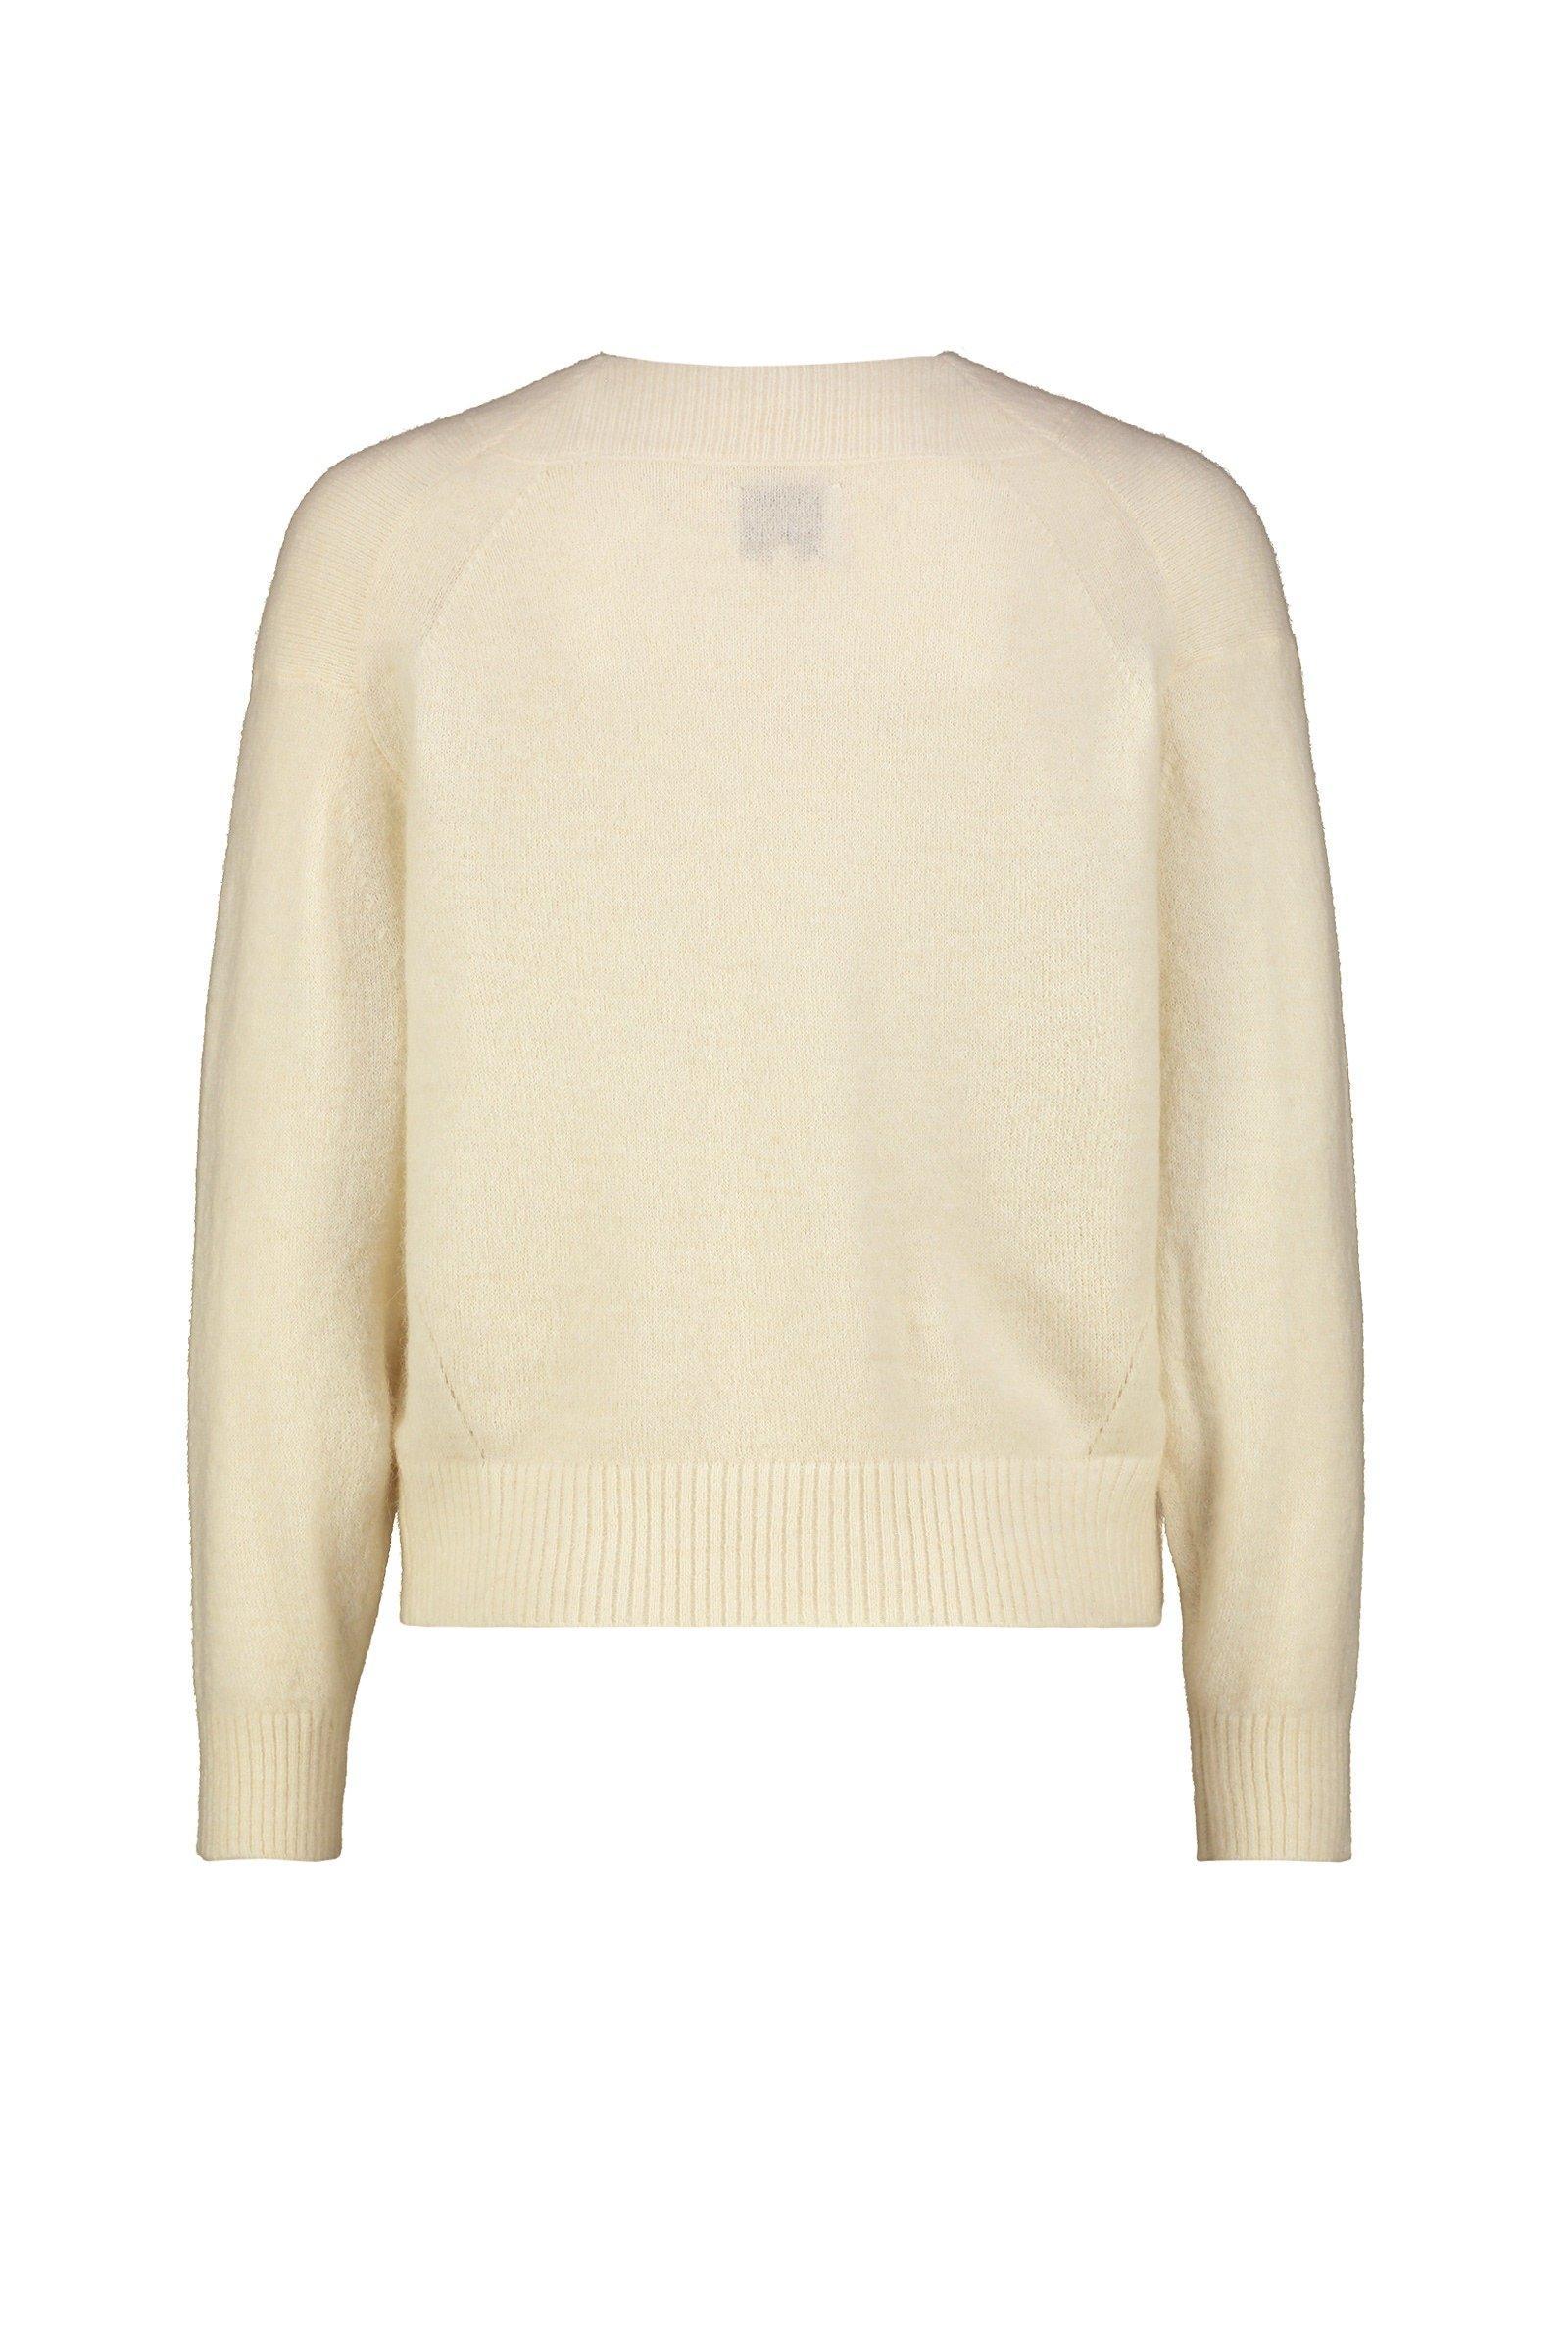 https://webmedia.cks-fashion.com/i/cks/118892WTM_100_h